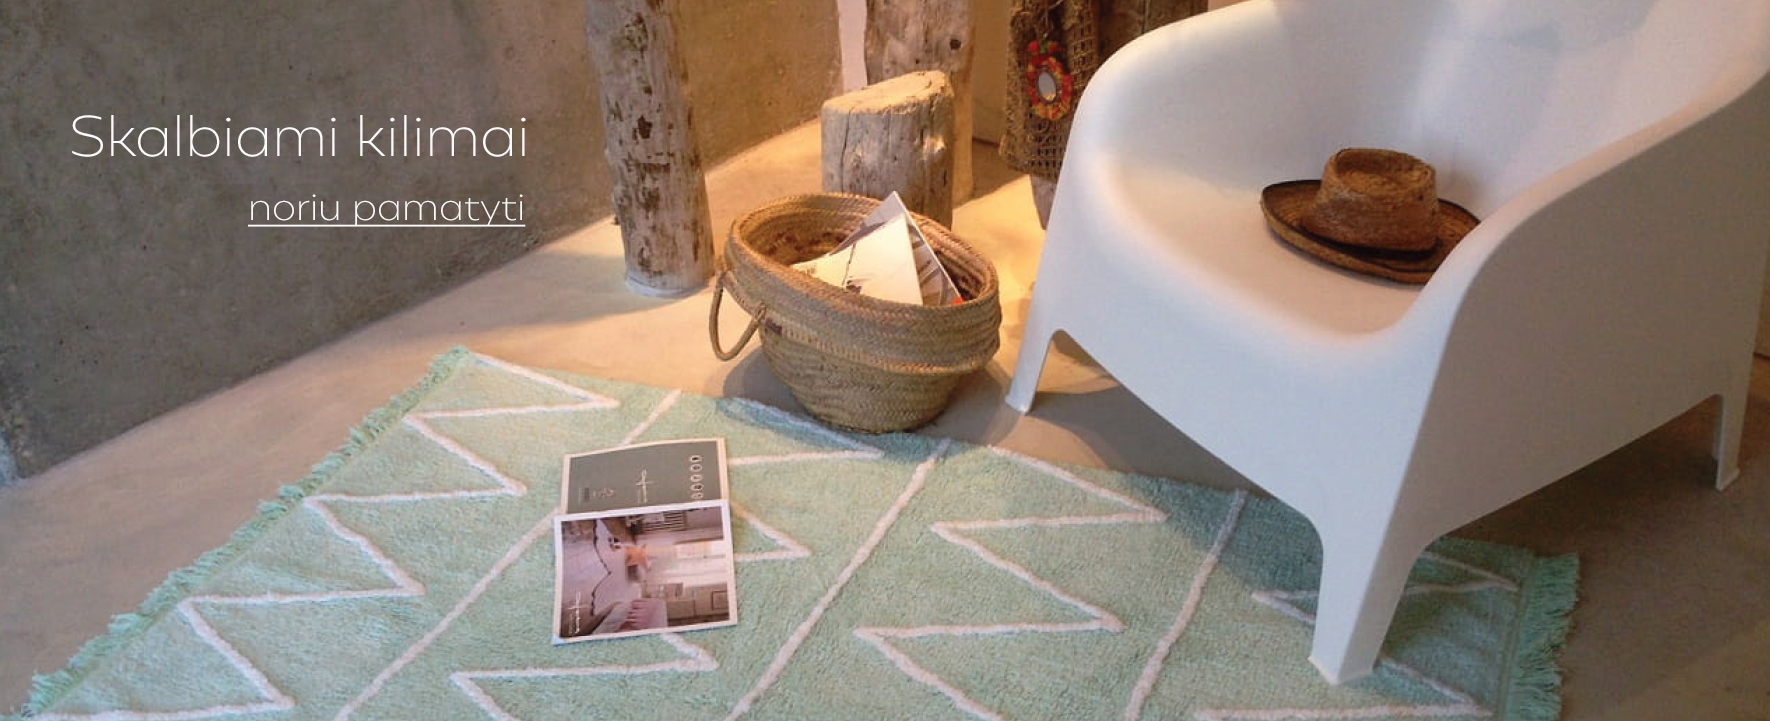 Lorena Canals skalbiami kilimai